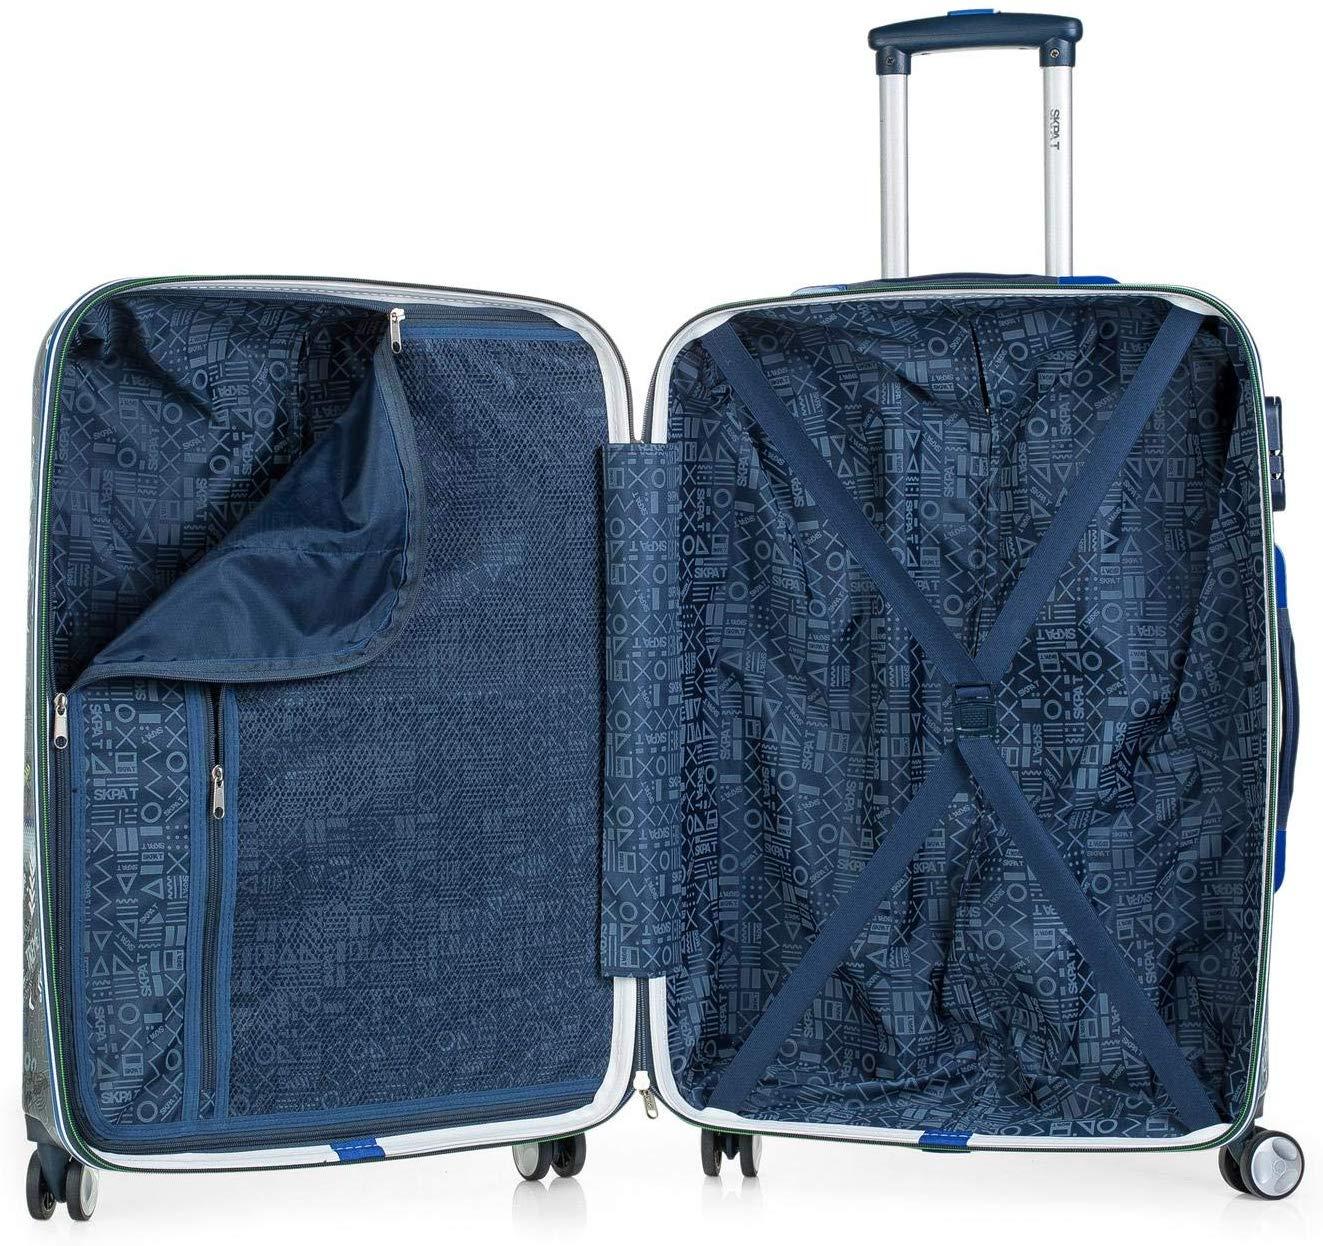 53860 maleta mediana skapa t extreme 4 ruedas interior